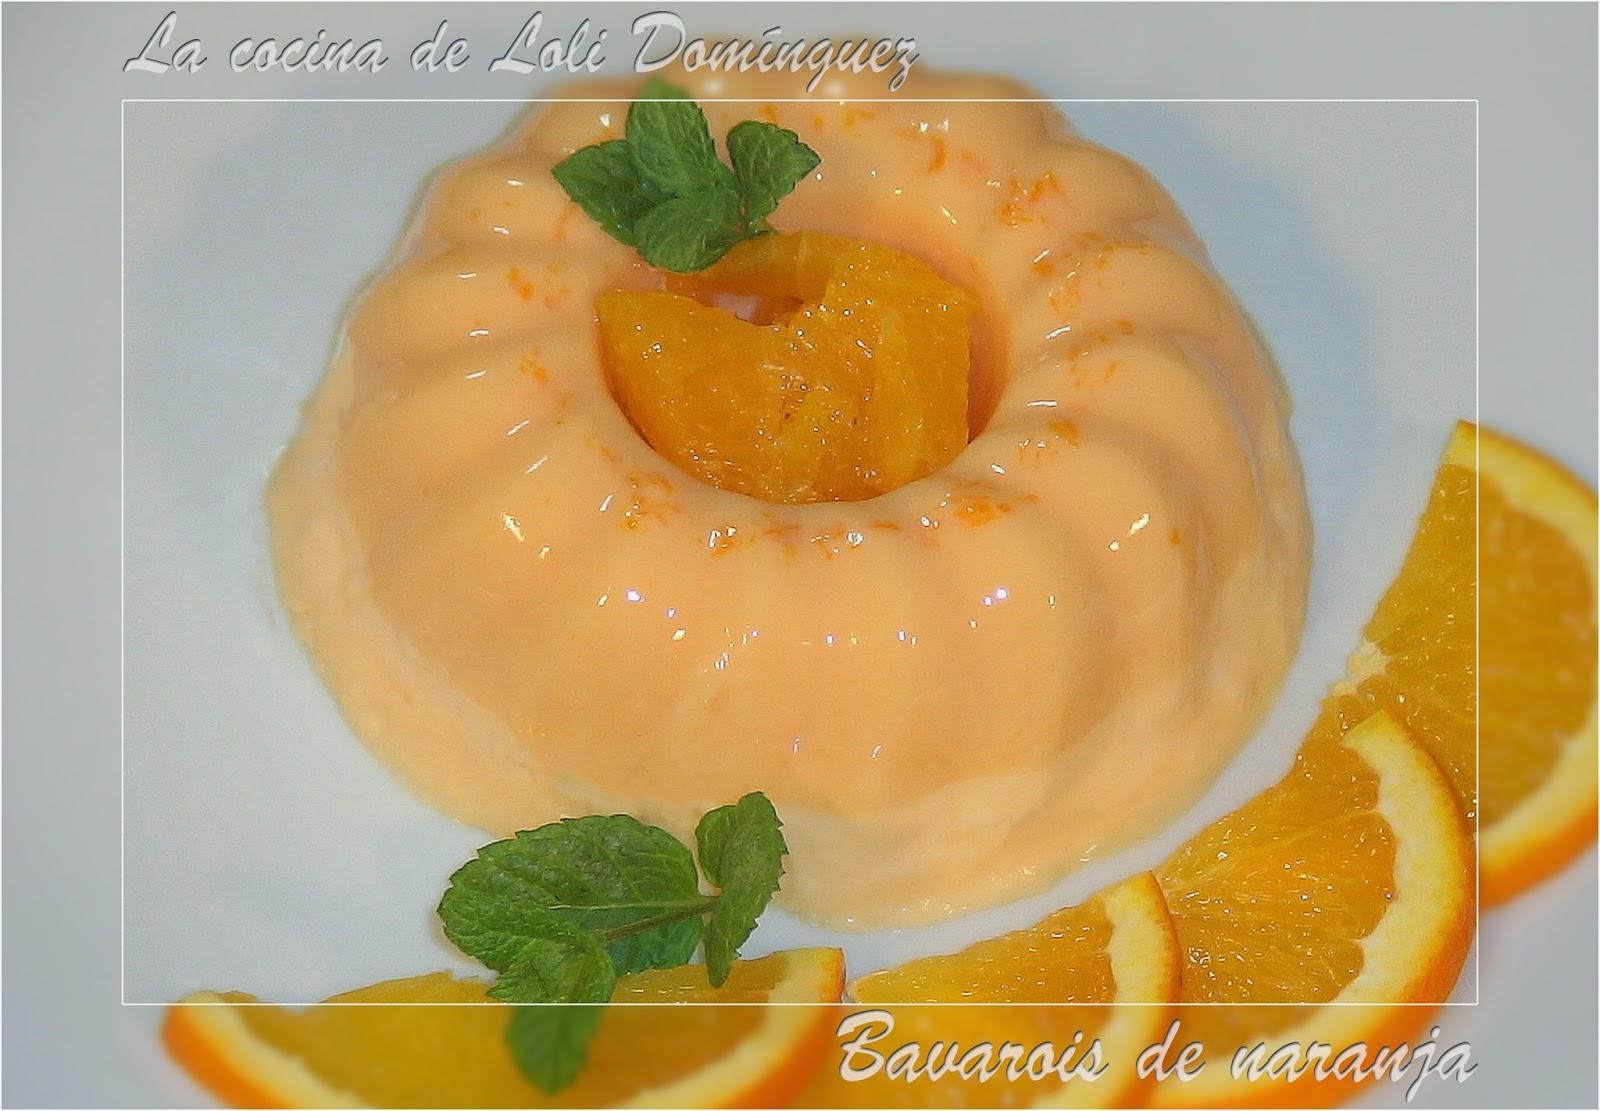 Bavarois de naranja